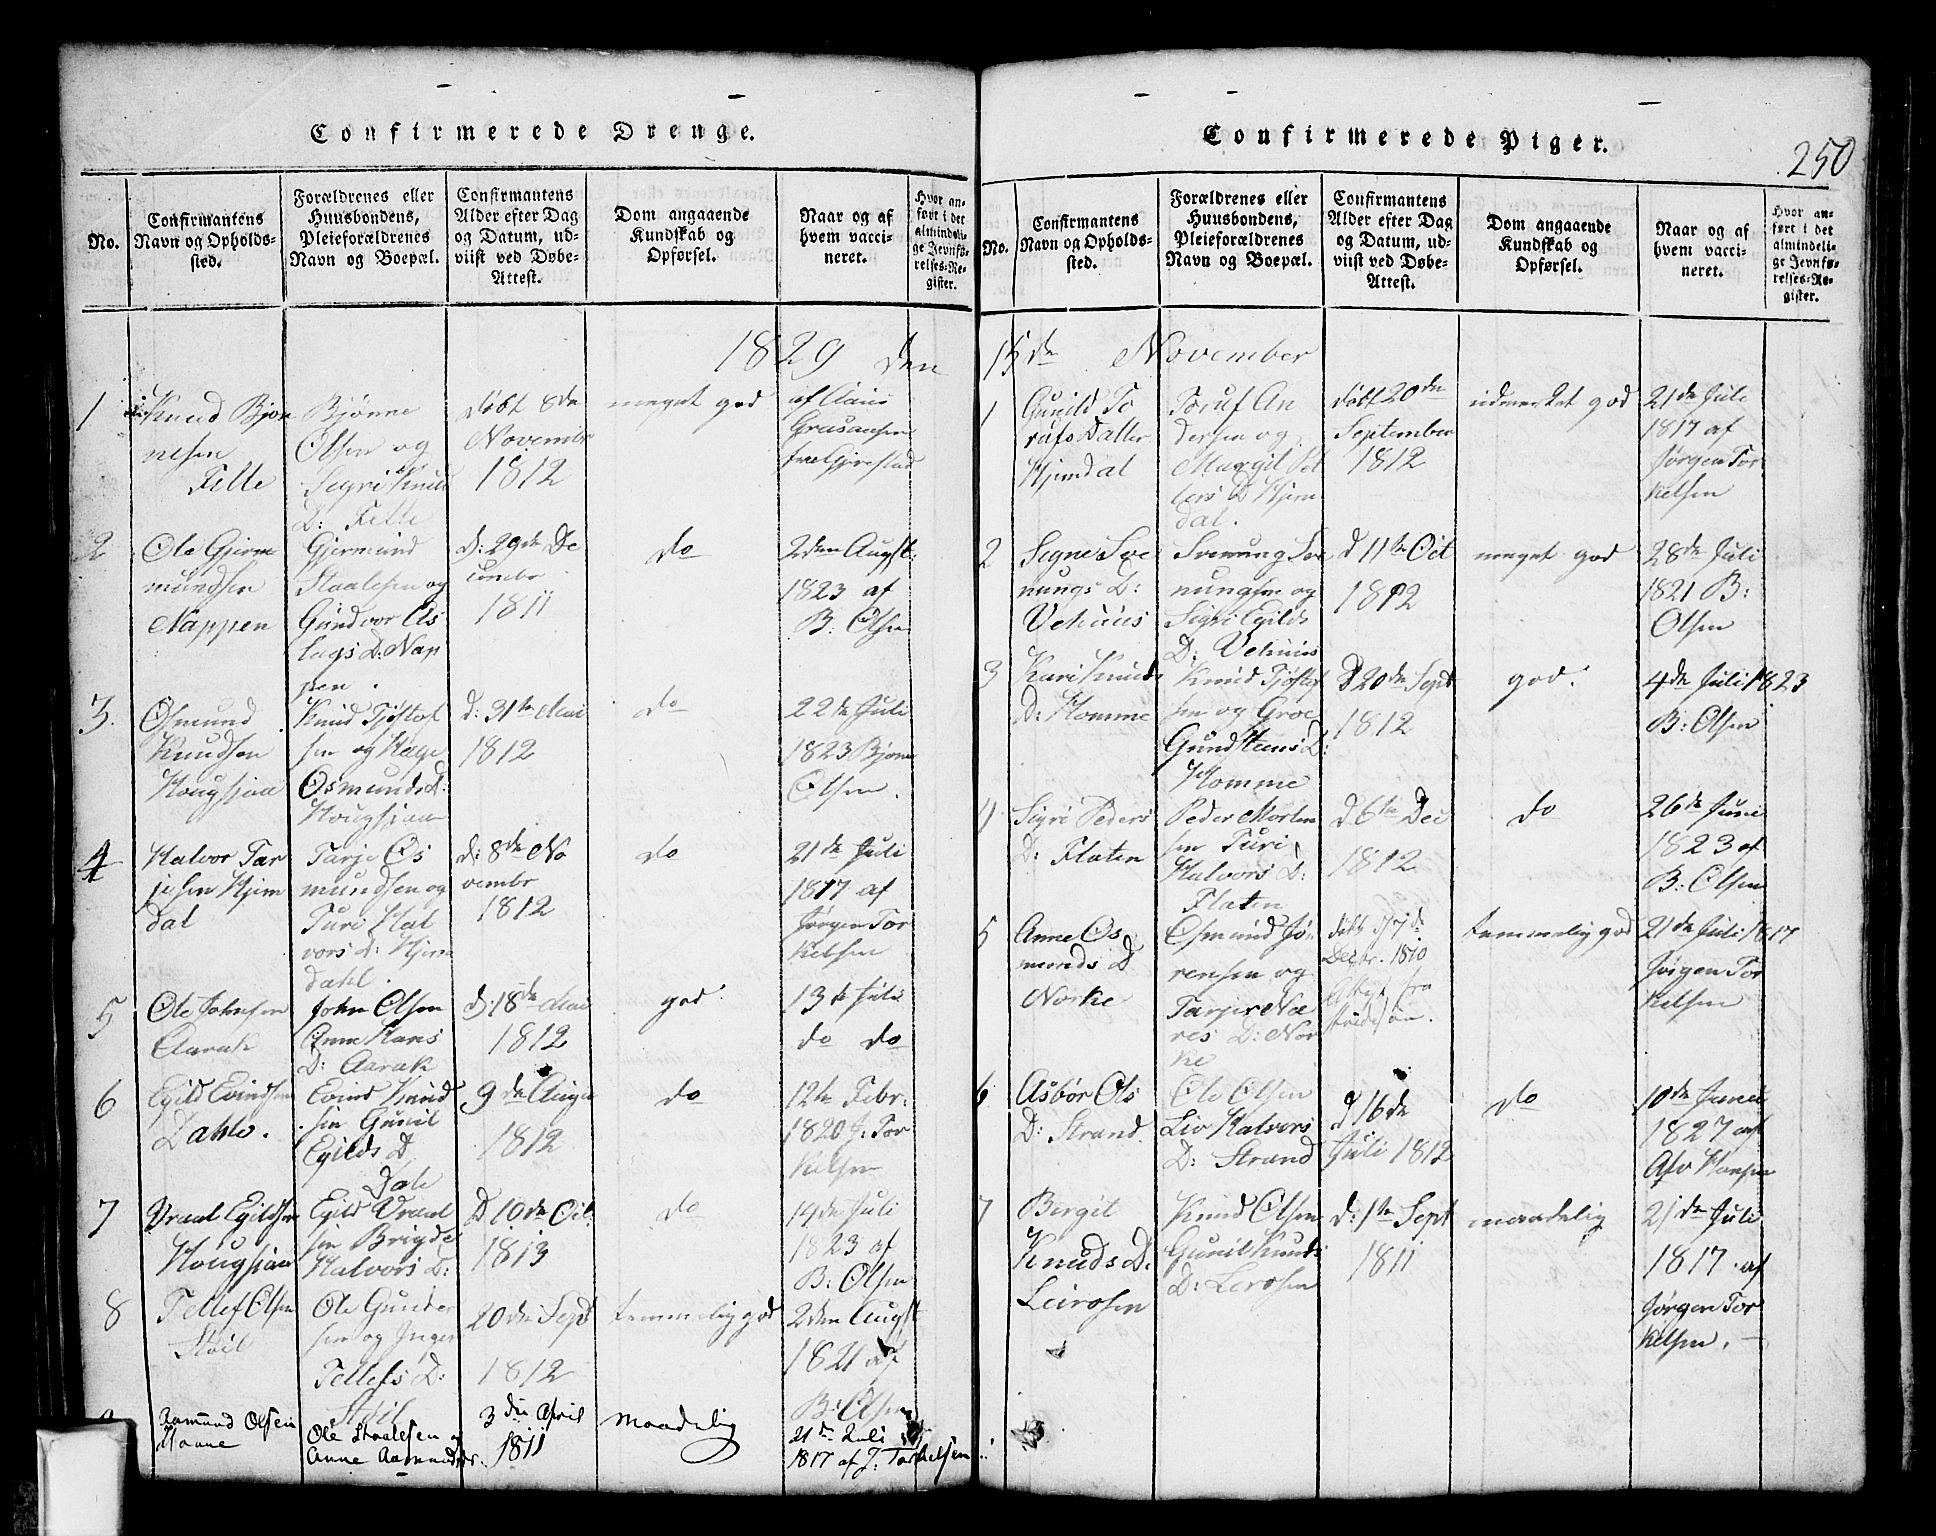 SAKO, Nissedal kirkebøker, G/Gb/L0001: Klokkerbok nr. II 1, 1814-1862, s. 250